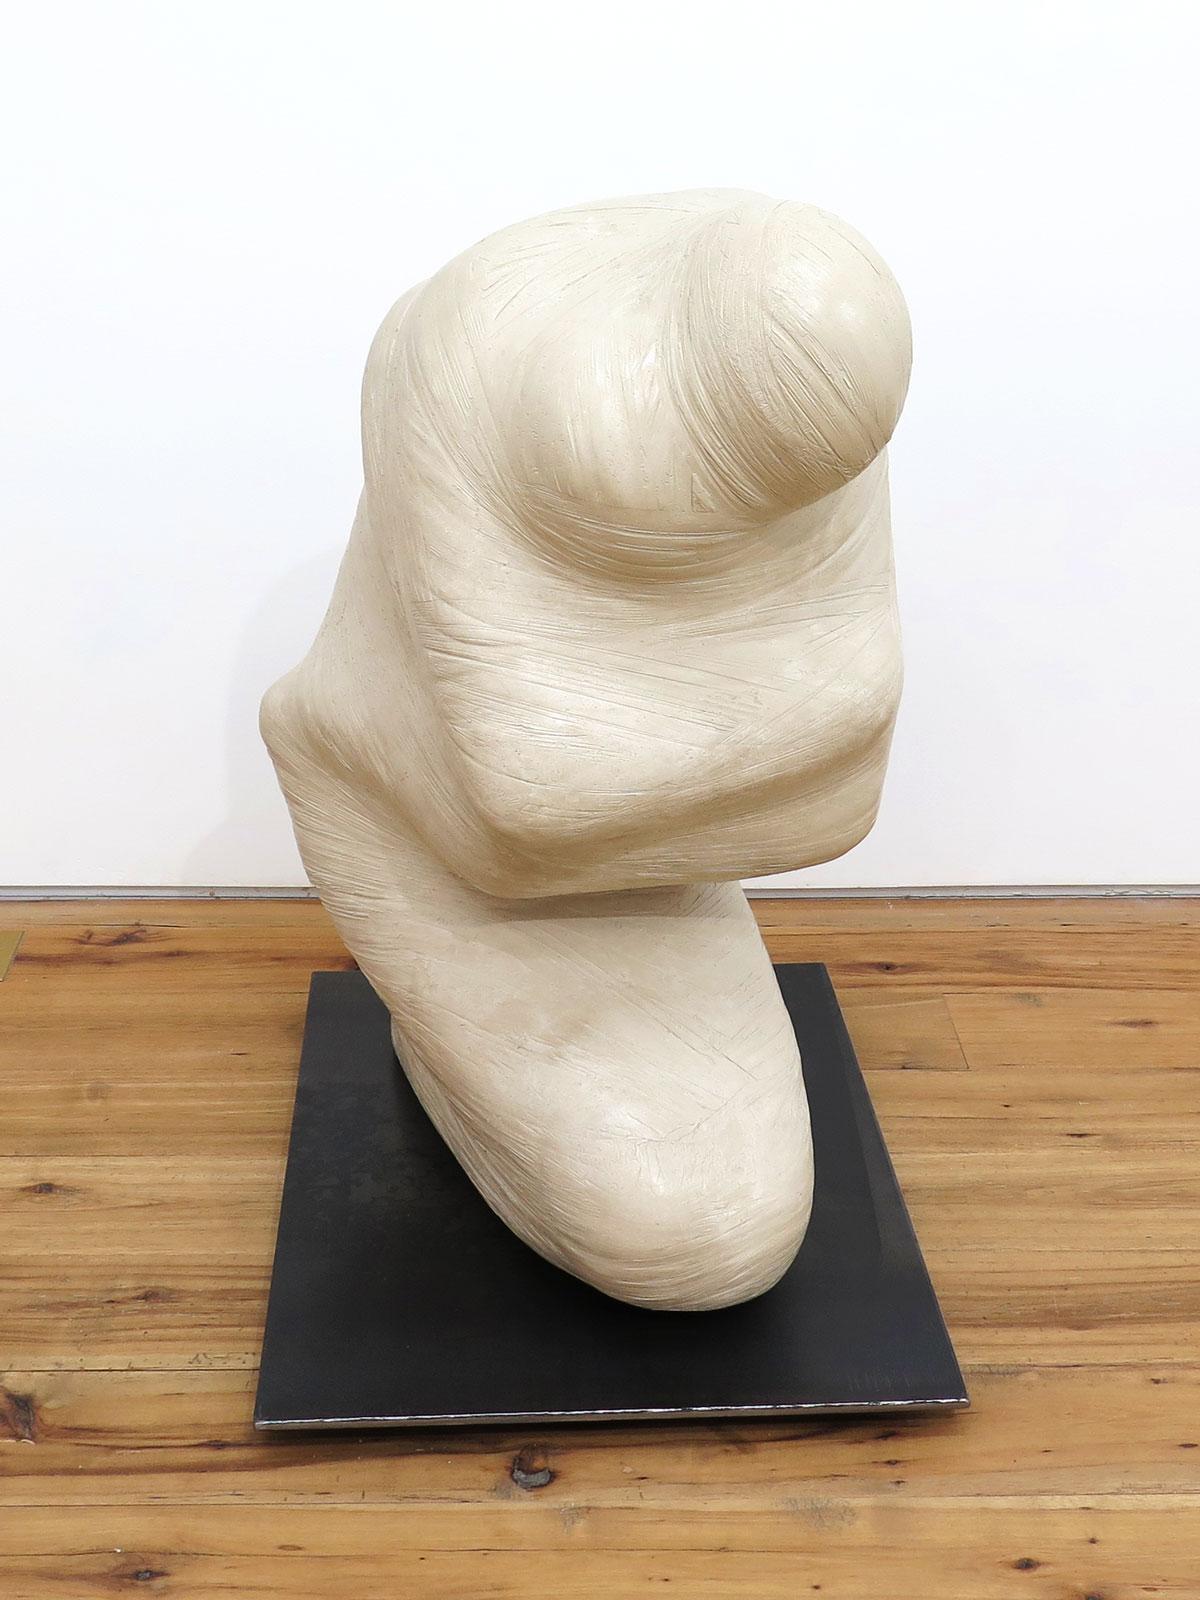 Emil Alzamora 2015 Gypsum 36 x 18 x 26 inches / 91 x 46 x 66 cm 2015 Marc Straus Gallery